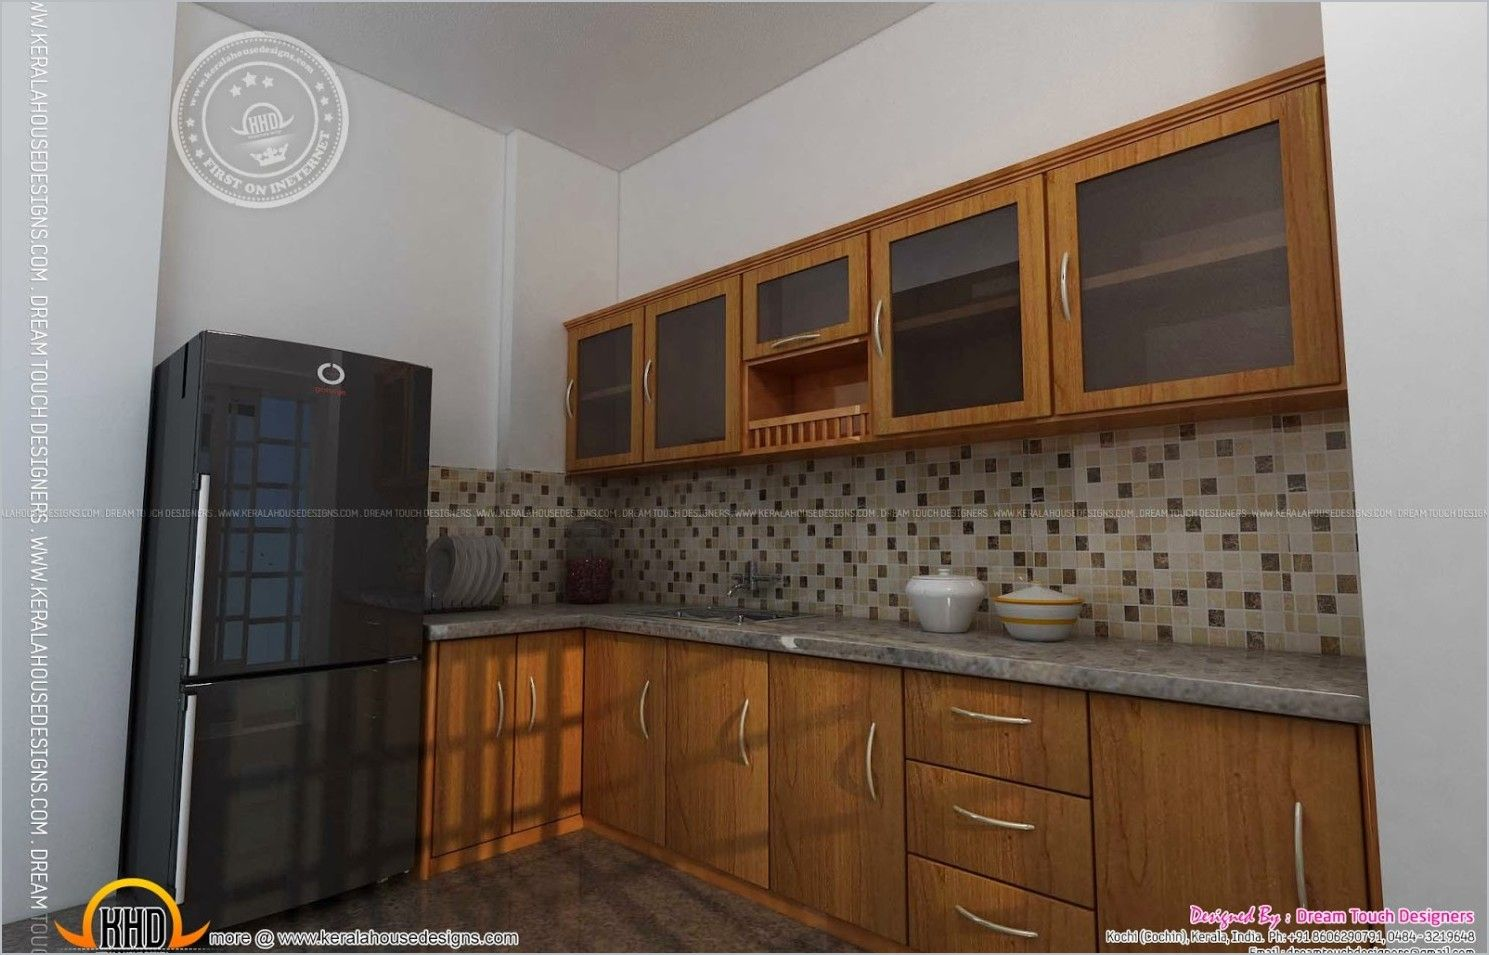 kitchendesigninkeralaindianhouseplans.jpg (1489×955